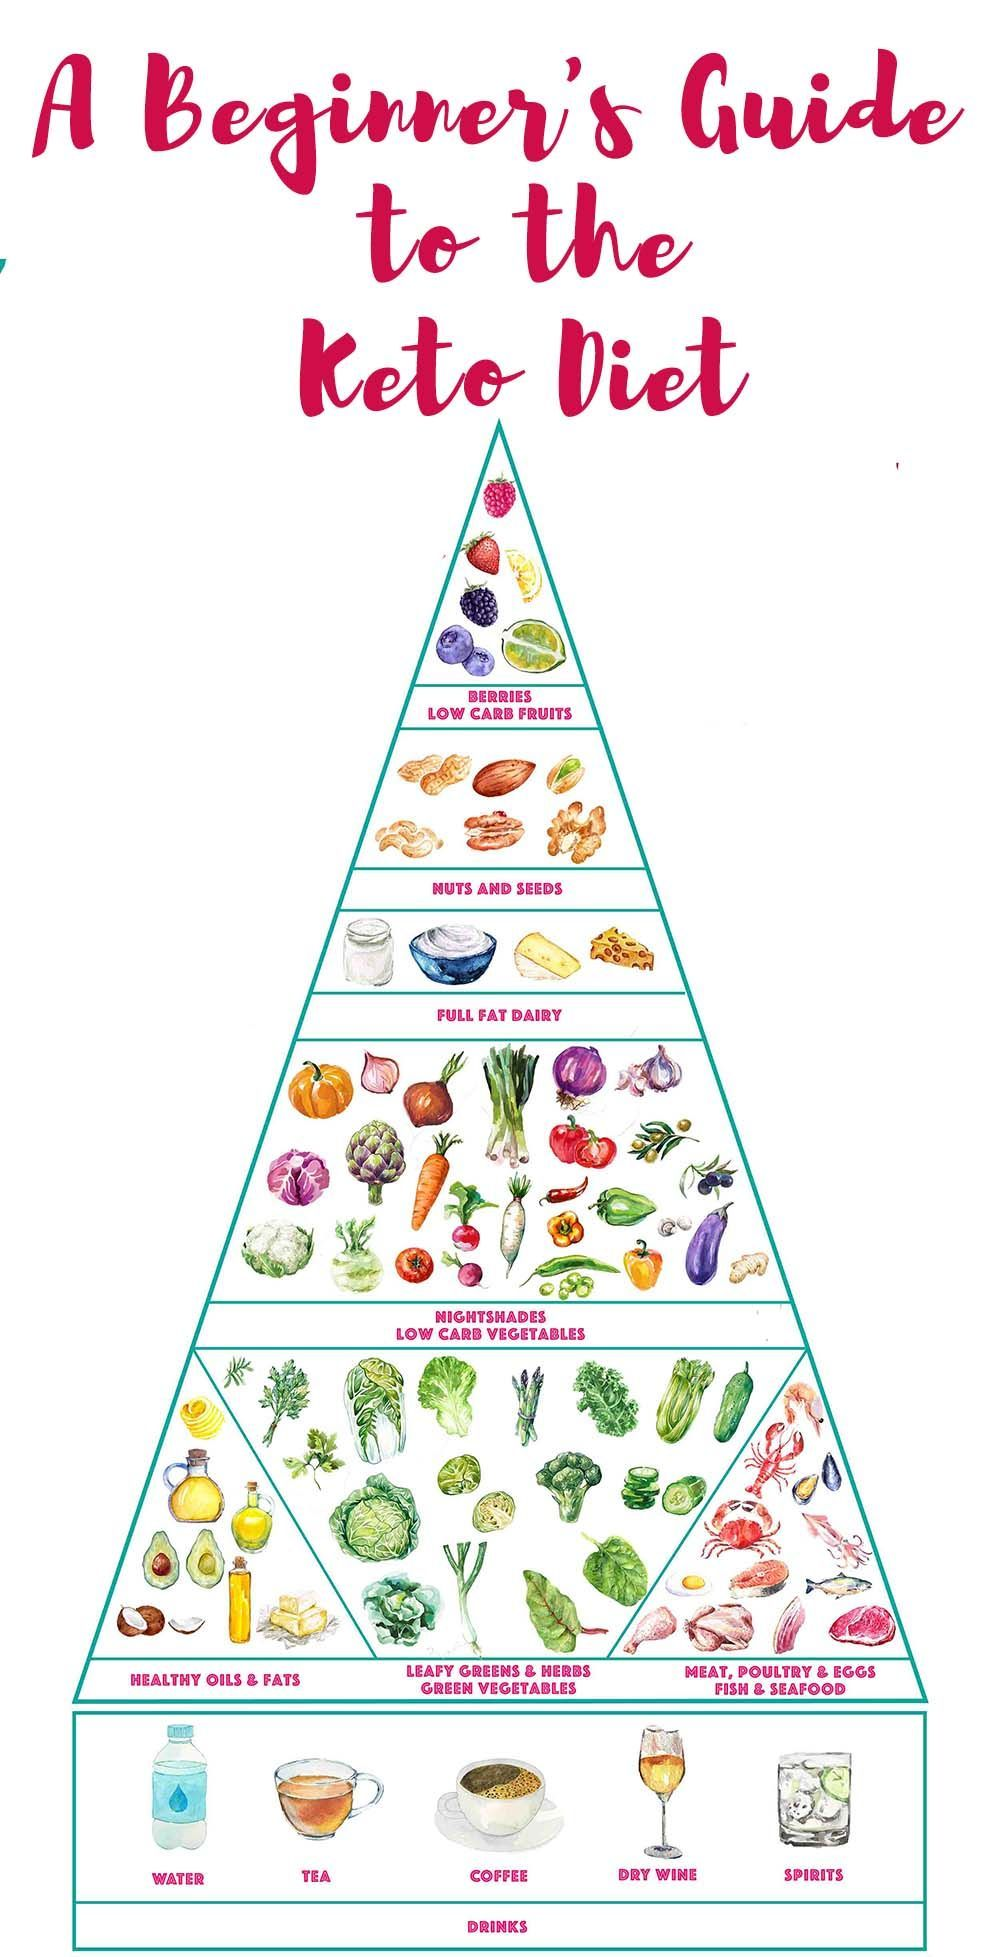 #Beginners #Diet #Guide #ketogenic #Ultimate #we